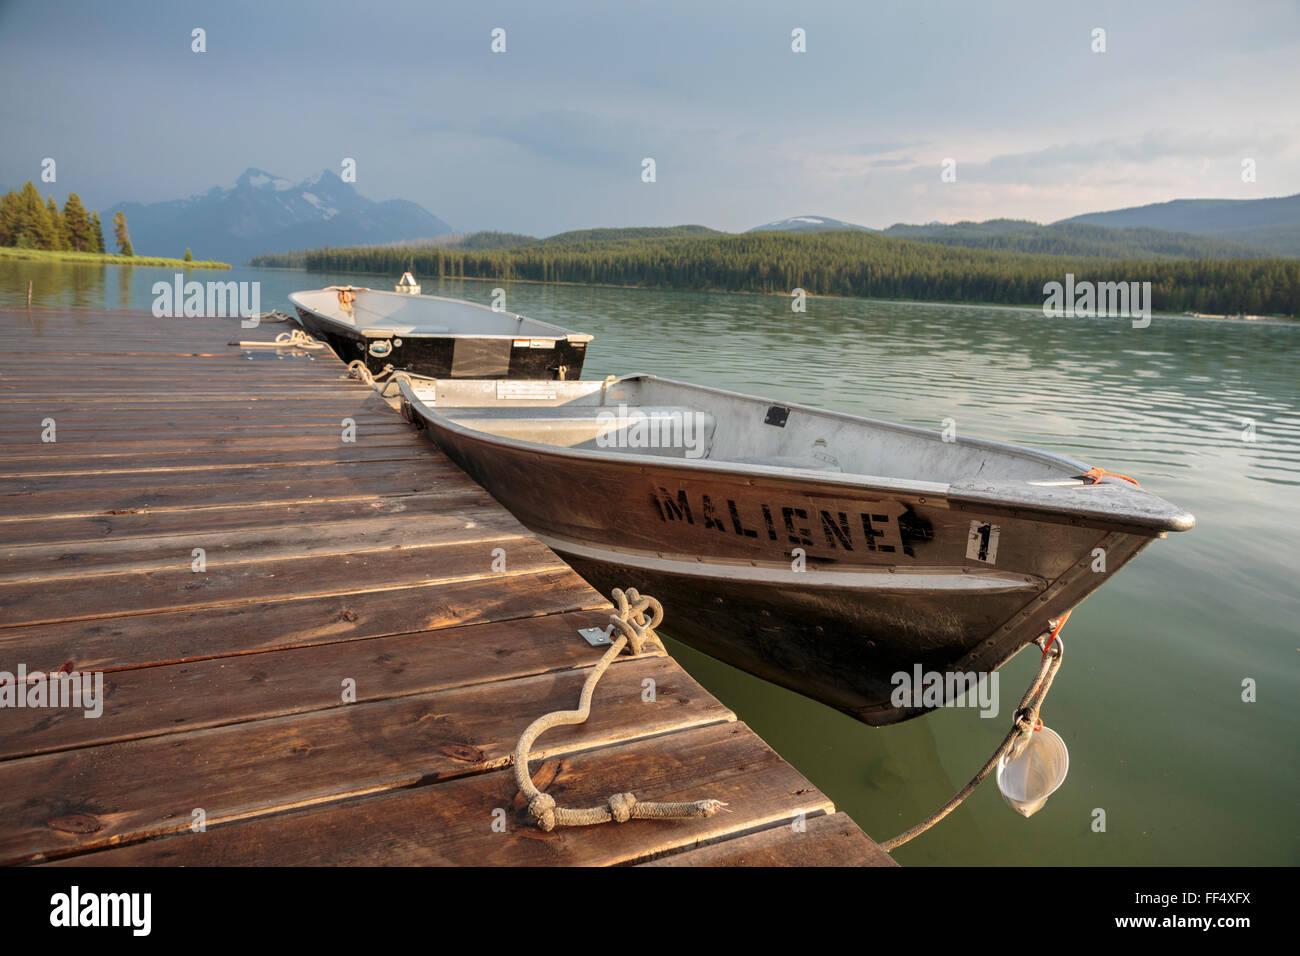 Canada immagini canada fotos stock alamy for Noleggio di cabine per lago